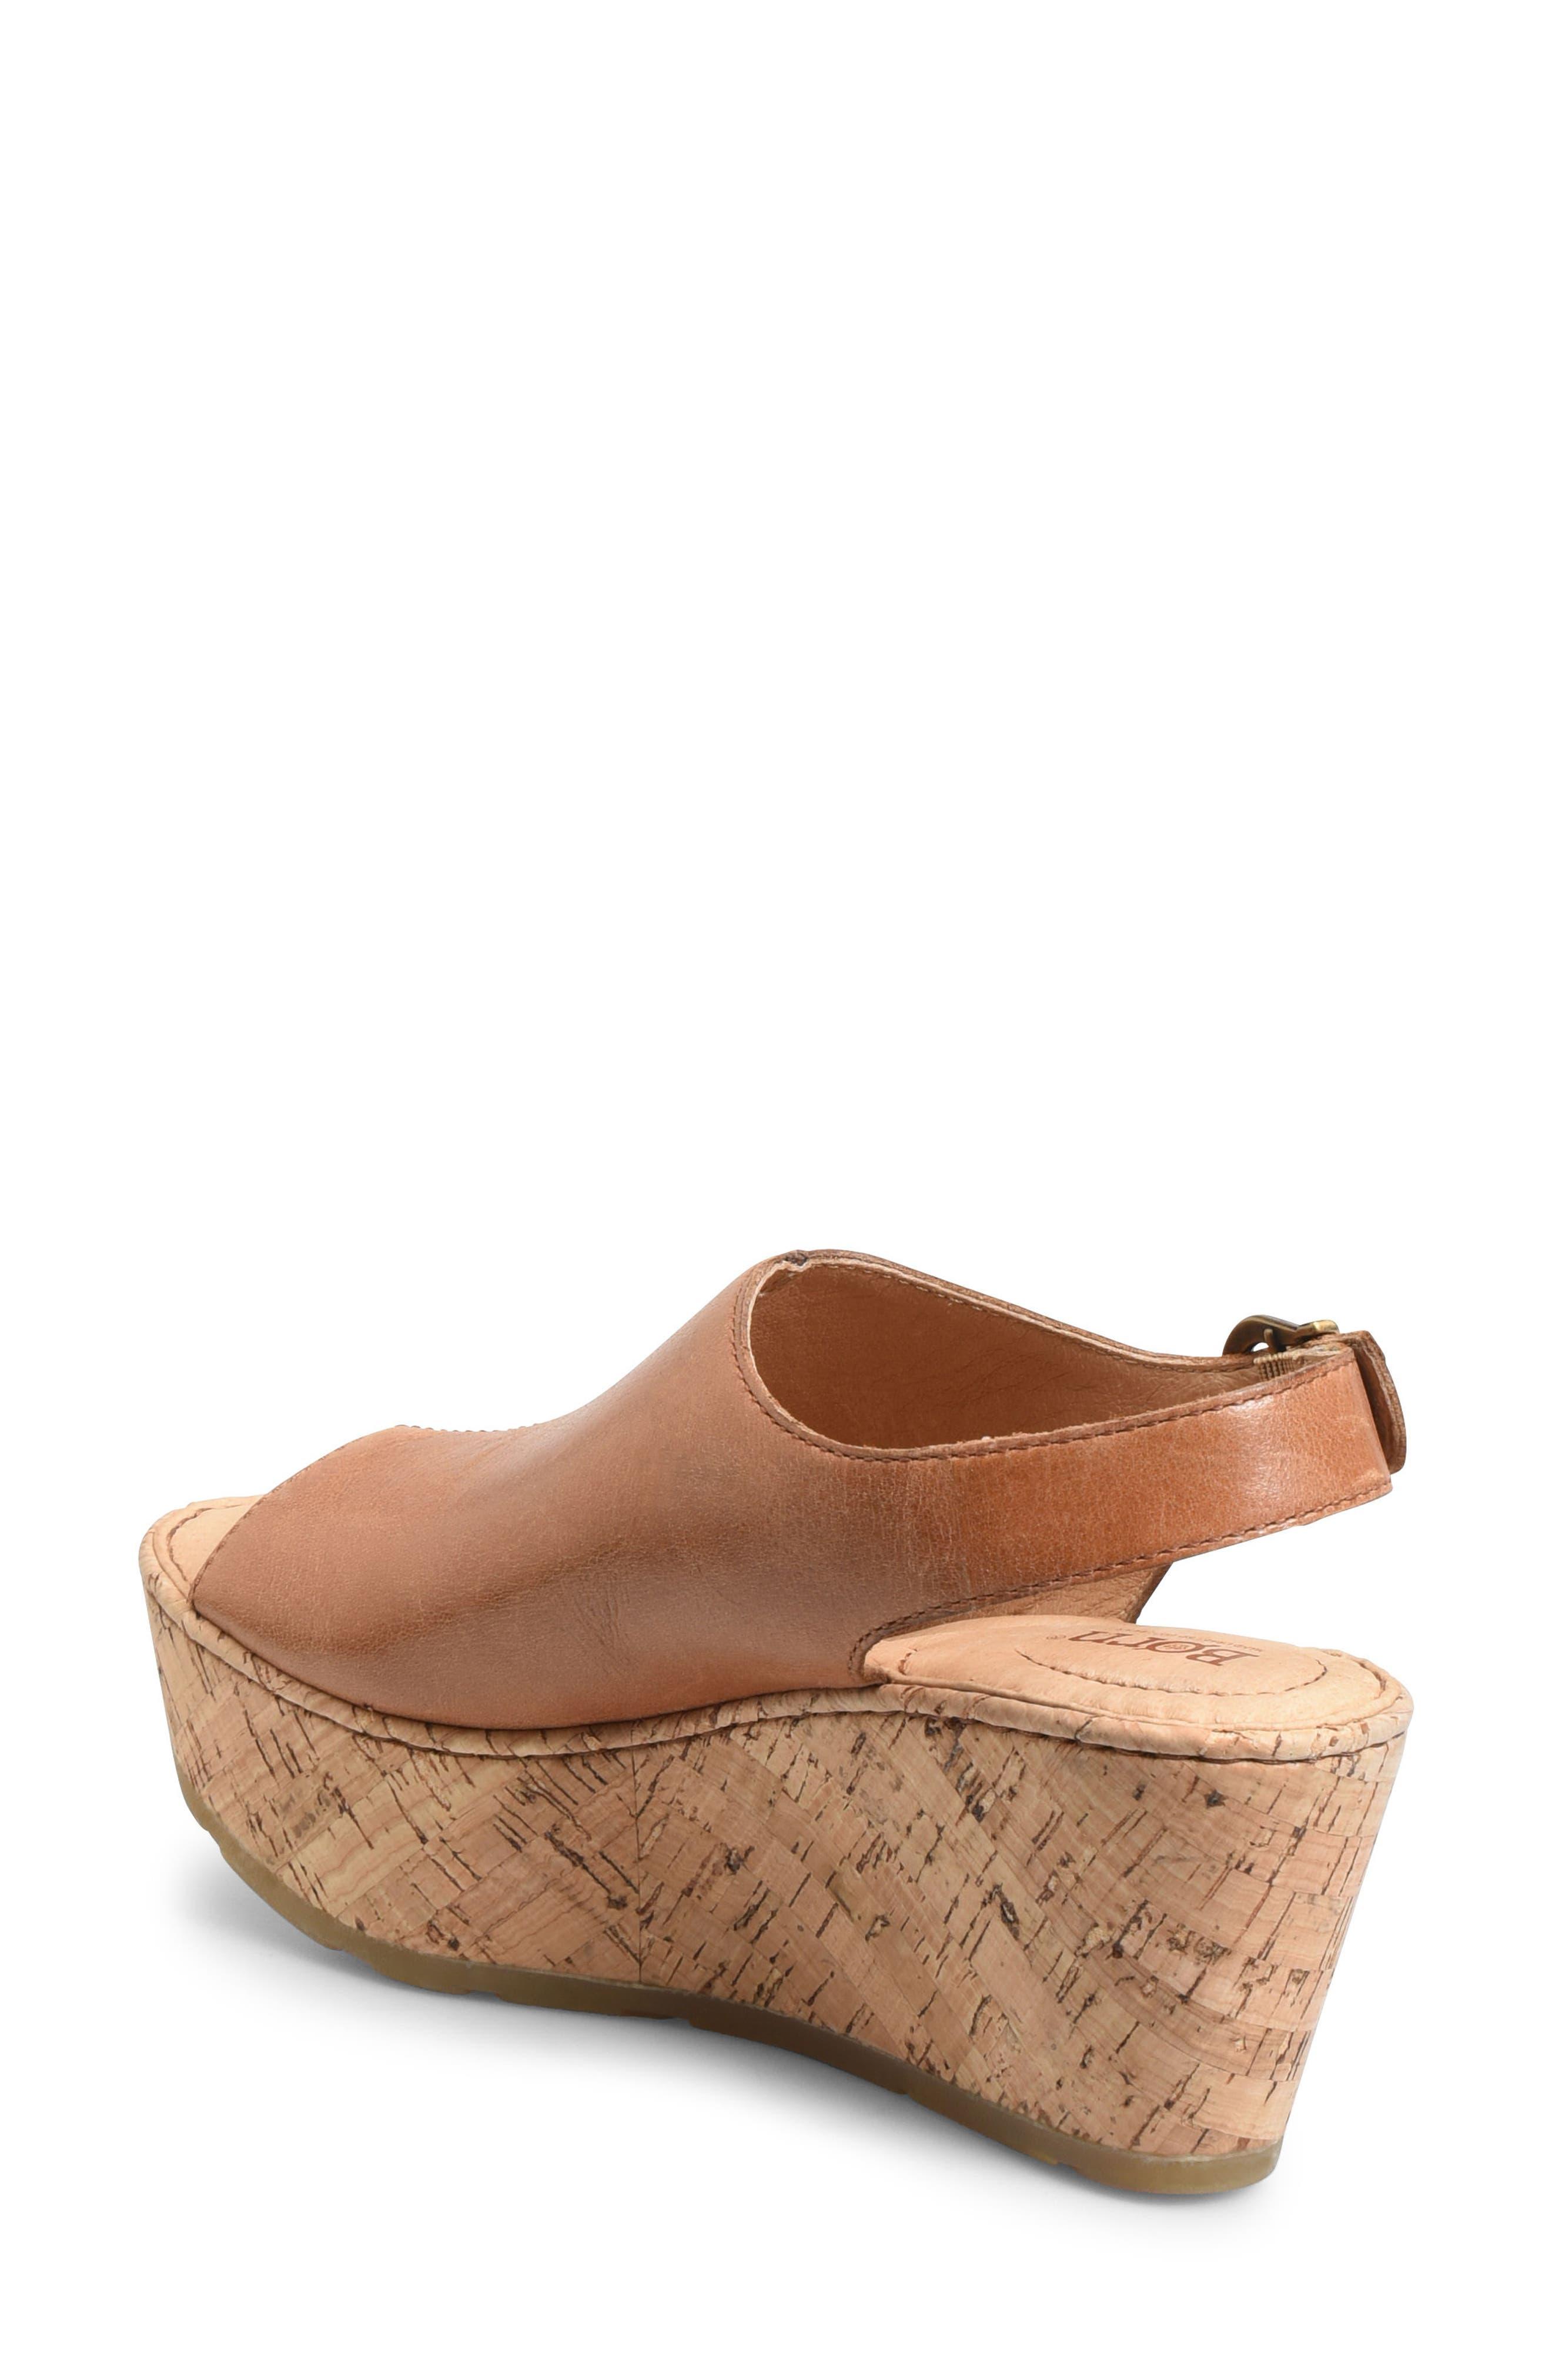 Orbit Platform Wedge Sandal,                             Alternate thumbnail 2, color,                             Brown Leather